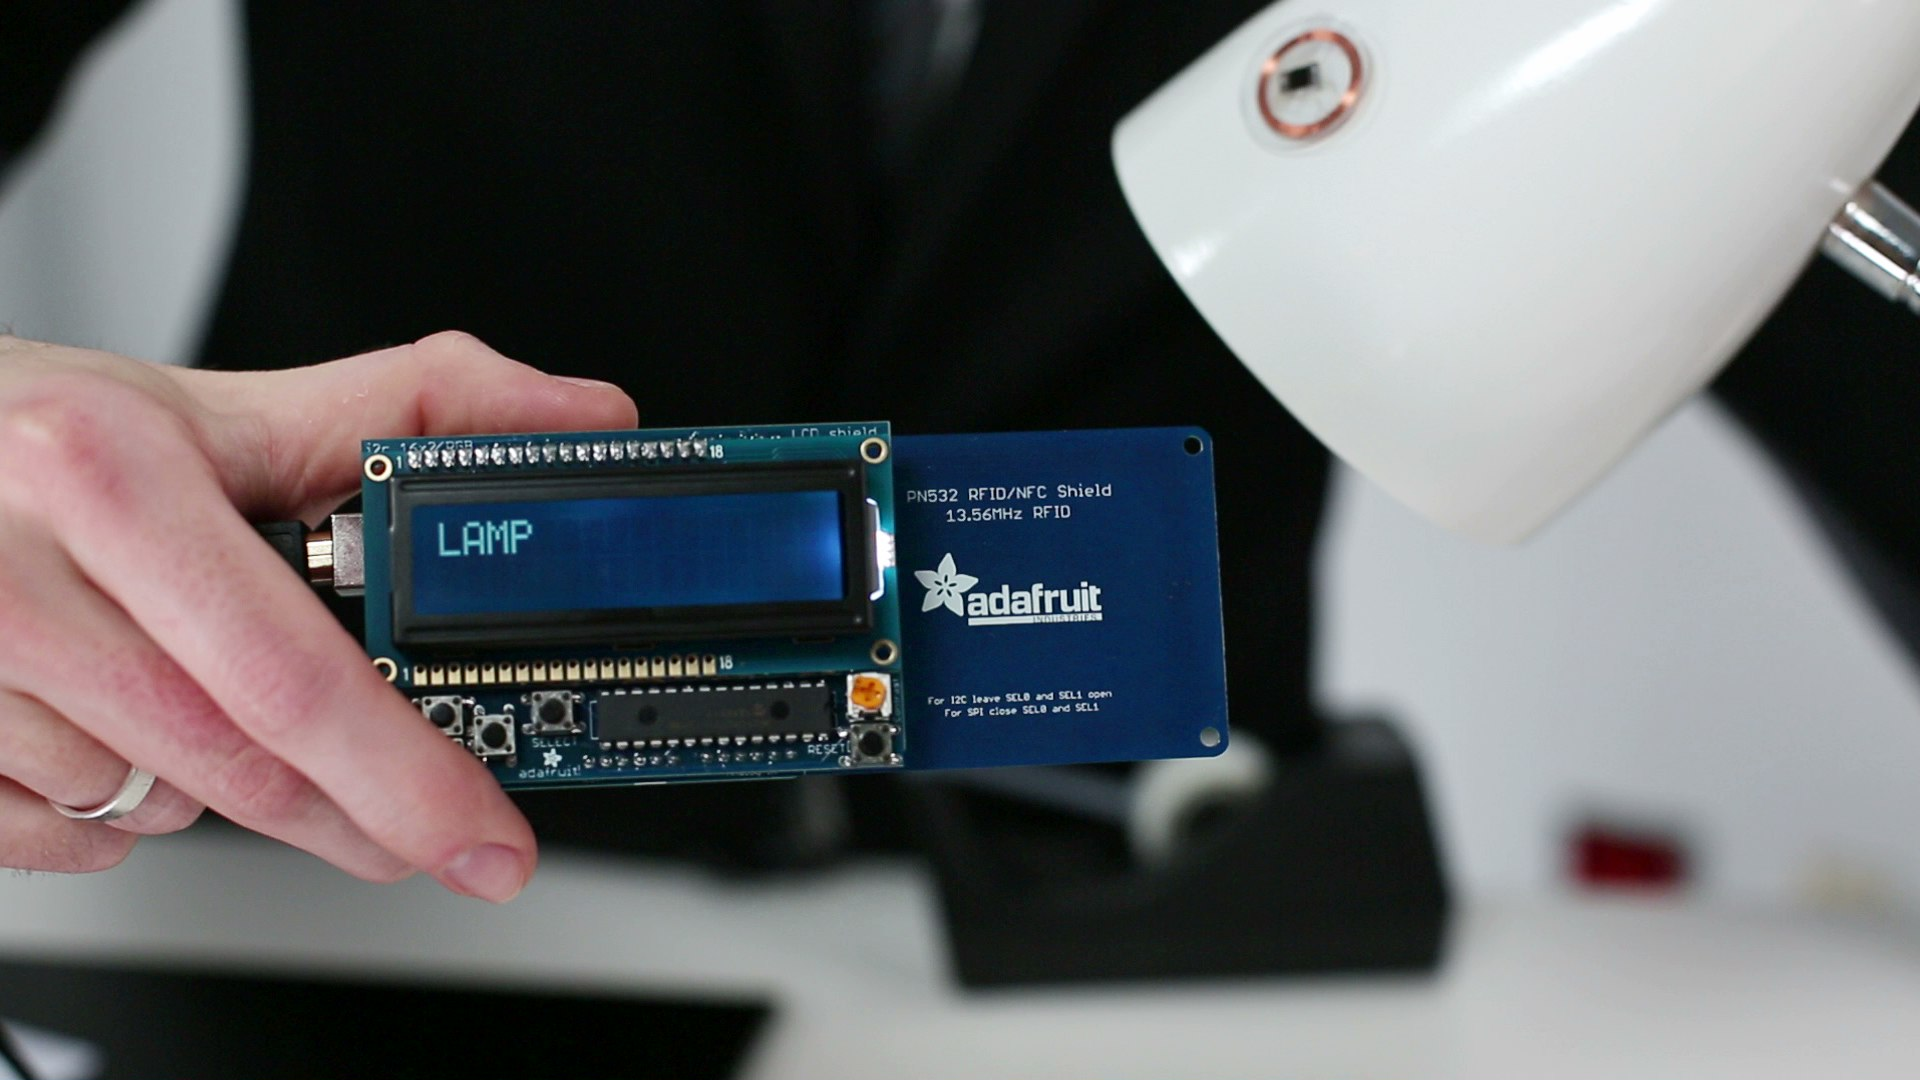 projects_Collin's_Lab_-_RFID-a-5.jpeg